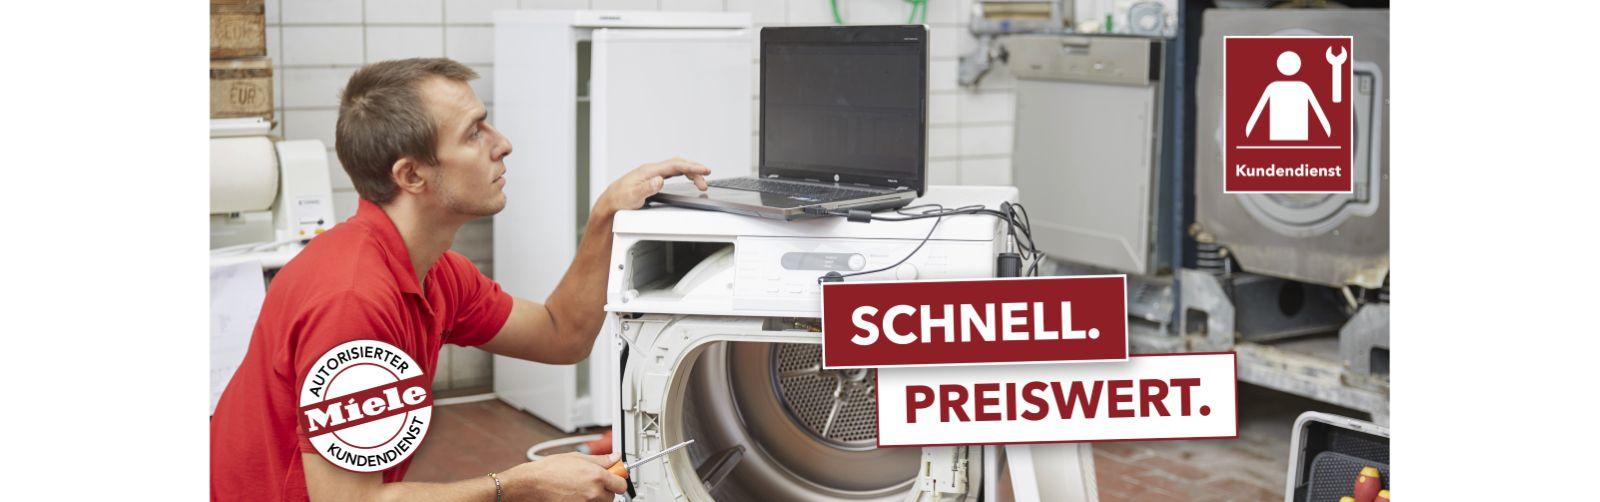 Hausgerate Elektro Schmidt Miele Spezial Vertragshandler Neu Isenburg